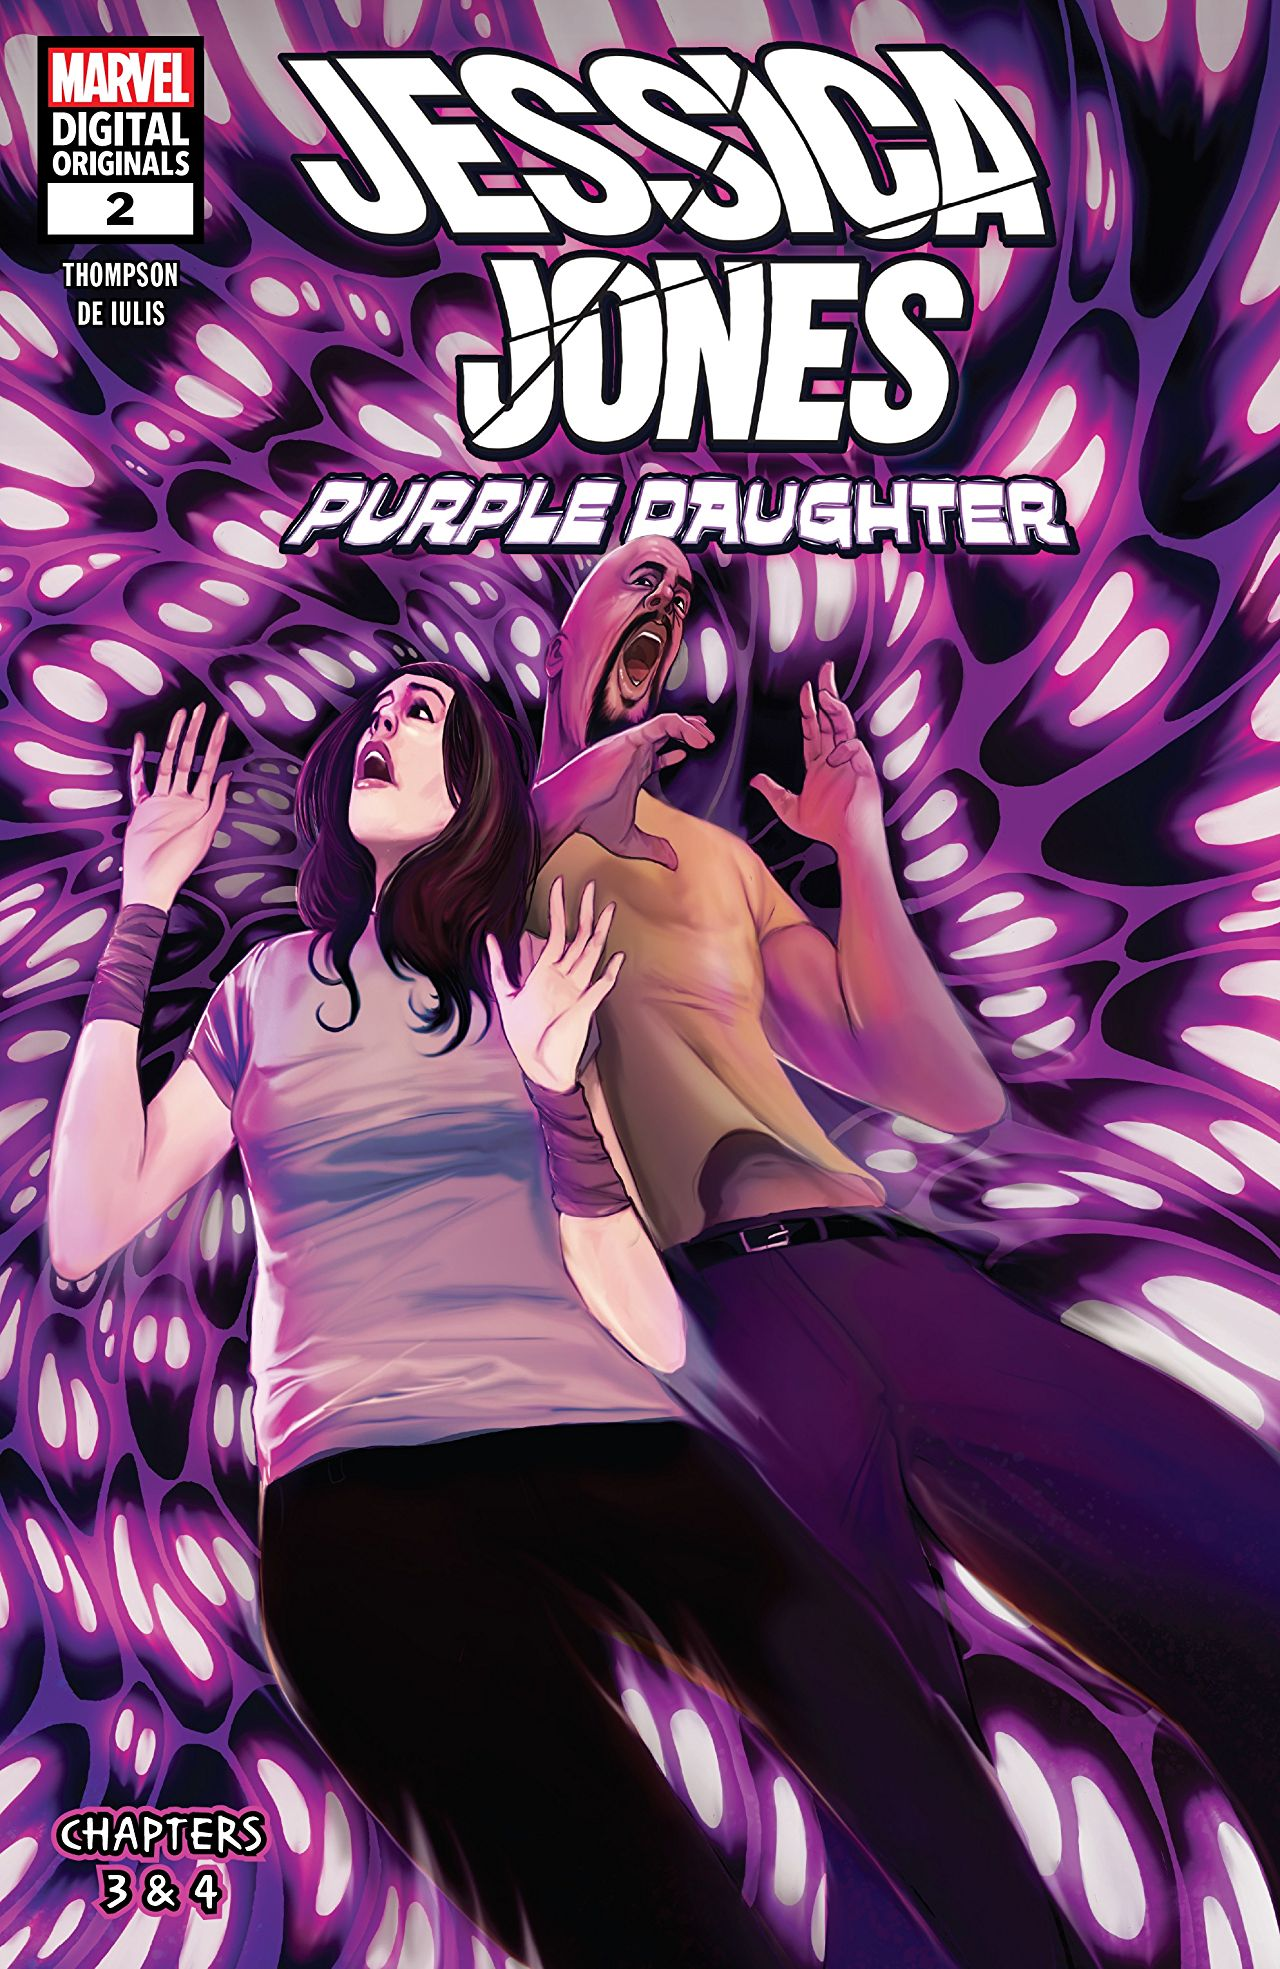 Jessica Jones: Purple Daughter - Marvel Digital Original Vol 1 2